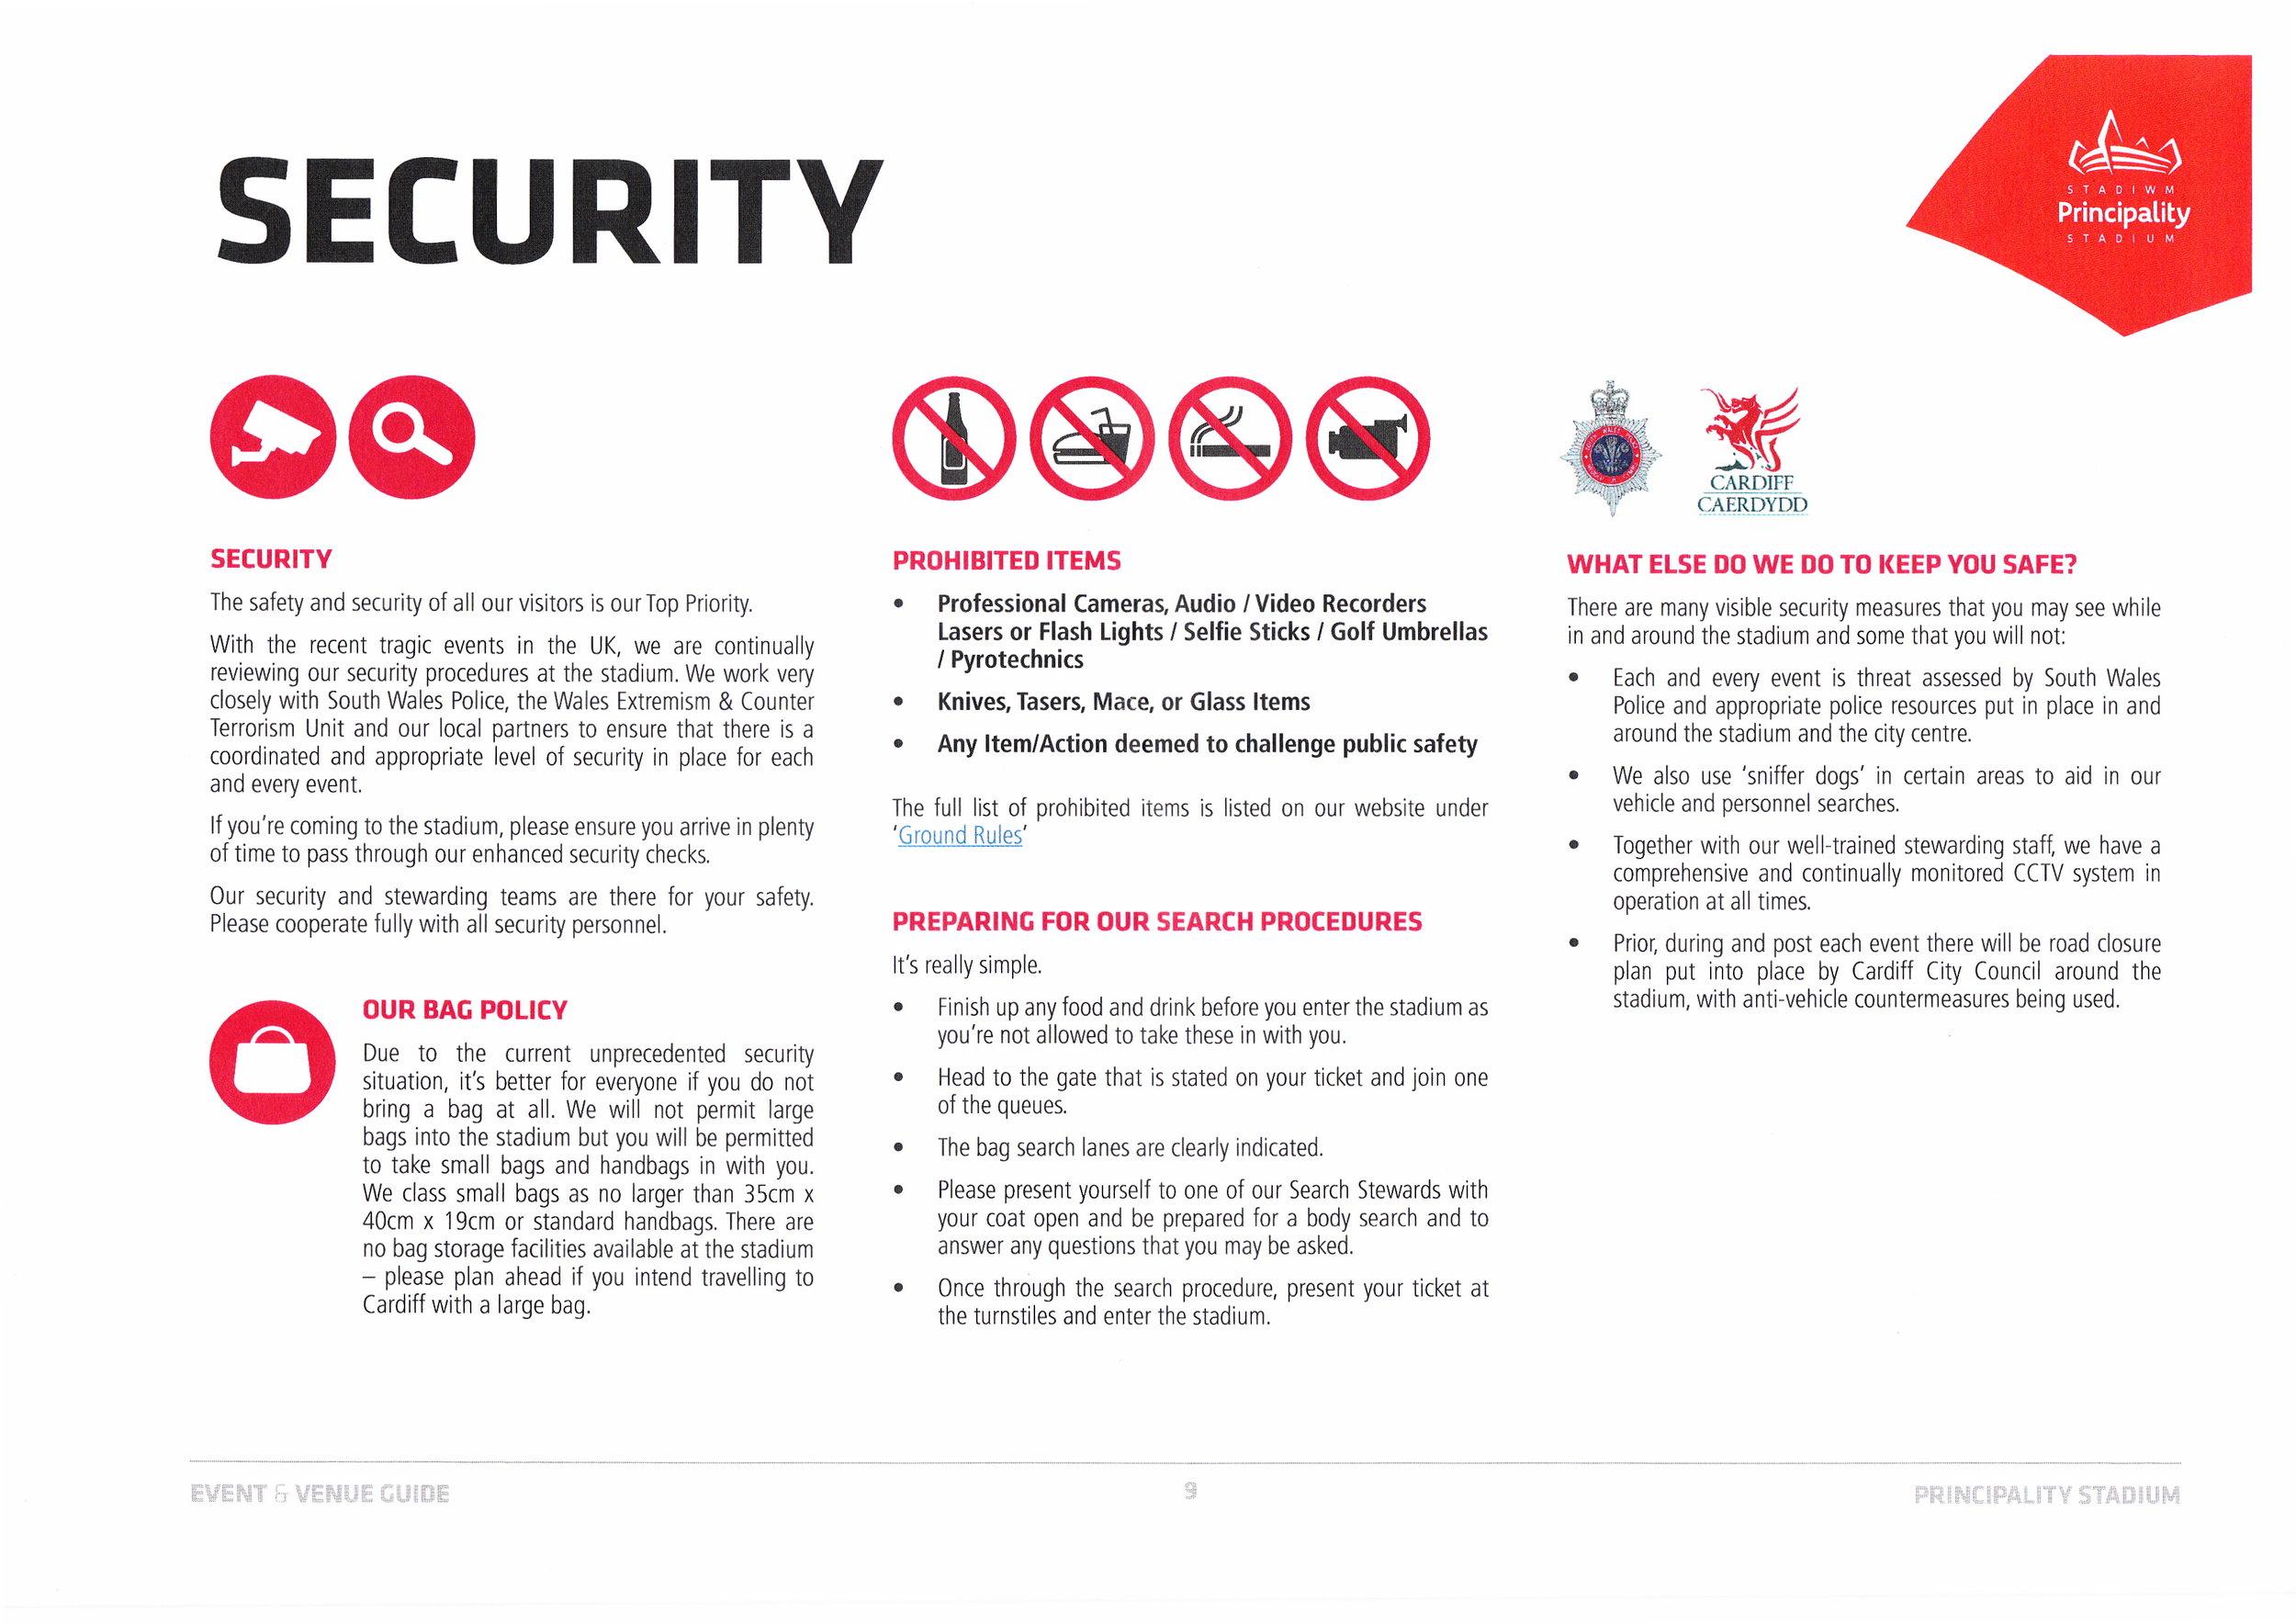 wru safety info_0006.jpg